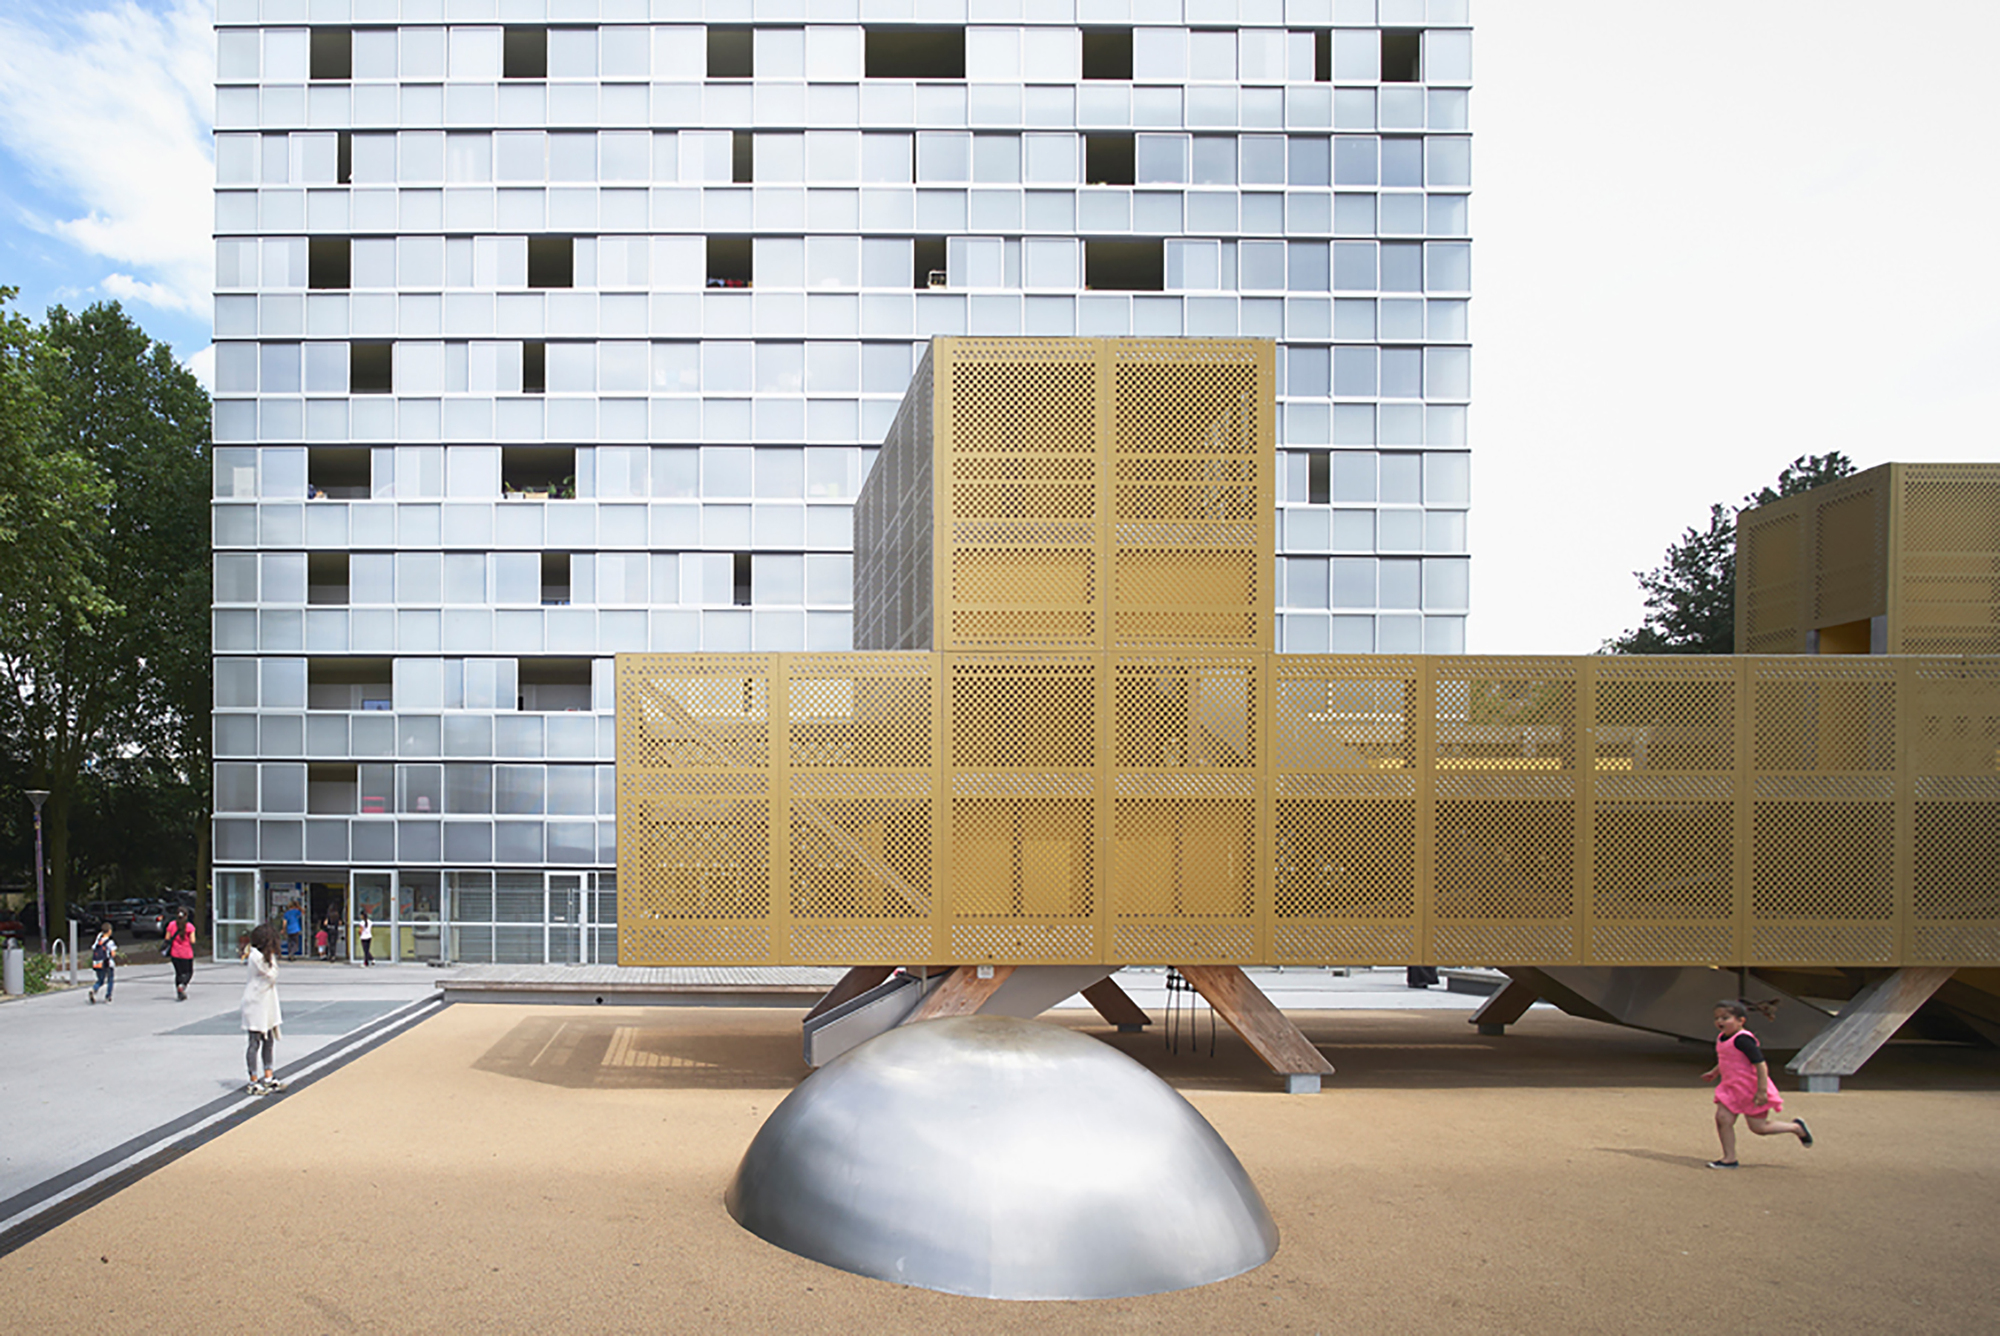 Urban renovation lormont lan architecture archdaily - Architectuur renovatie ...